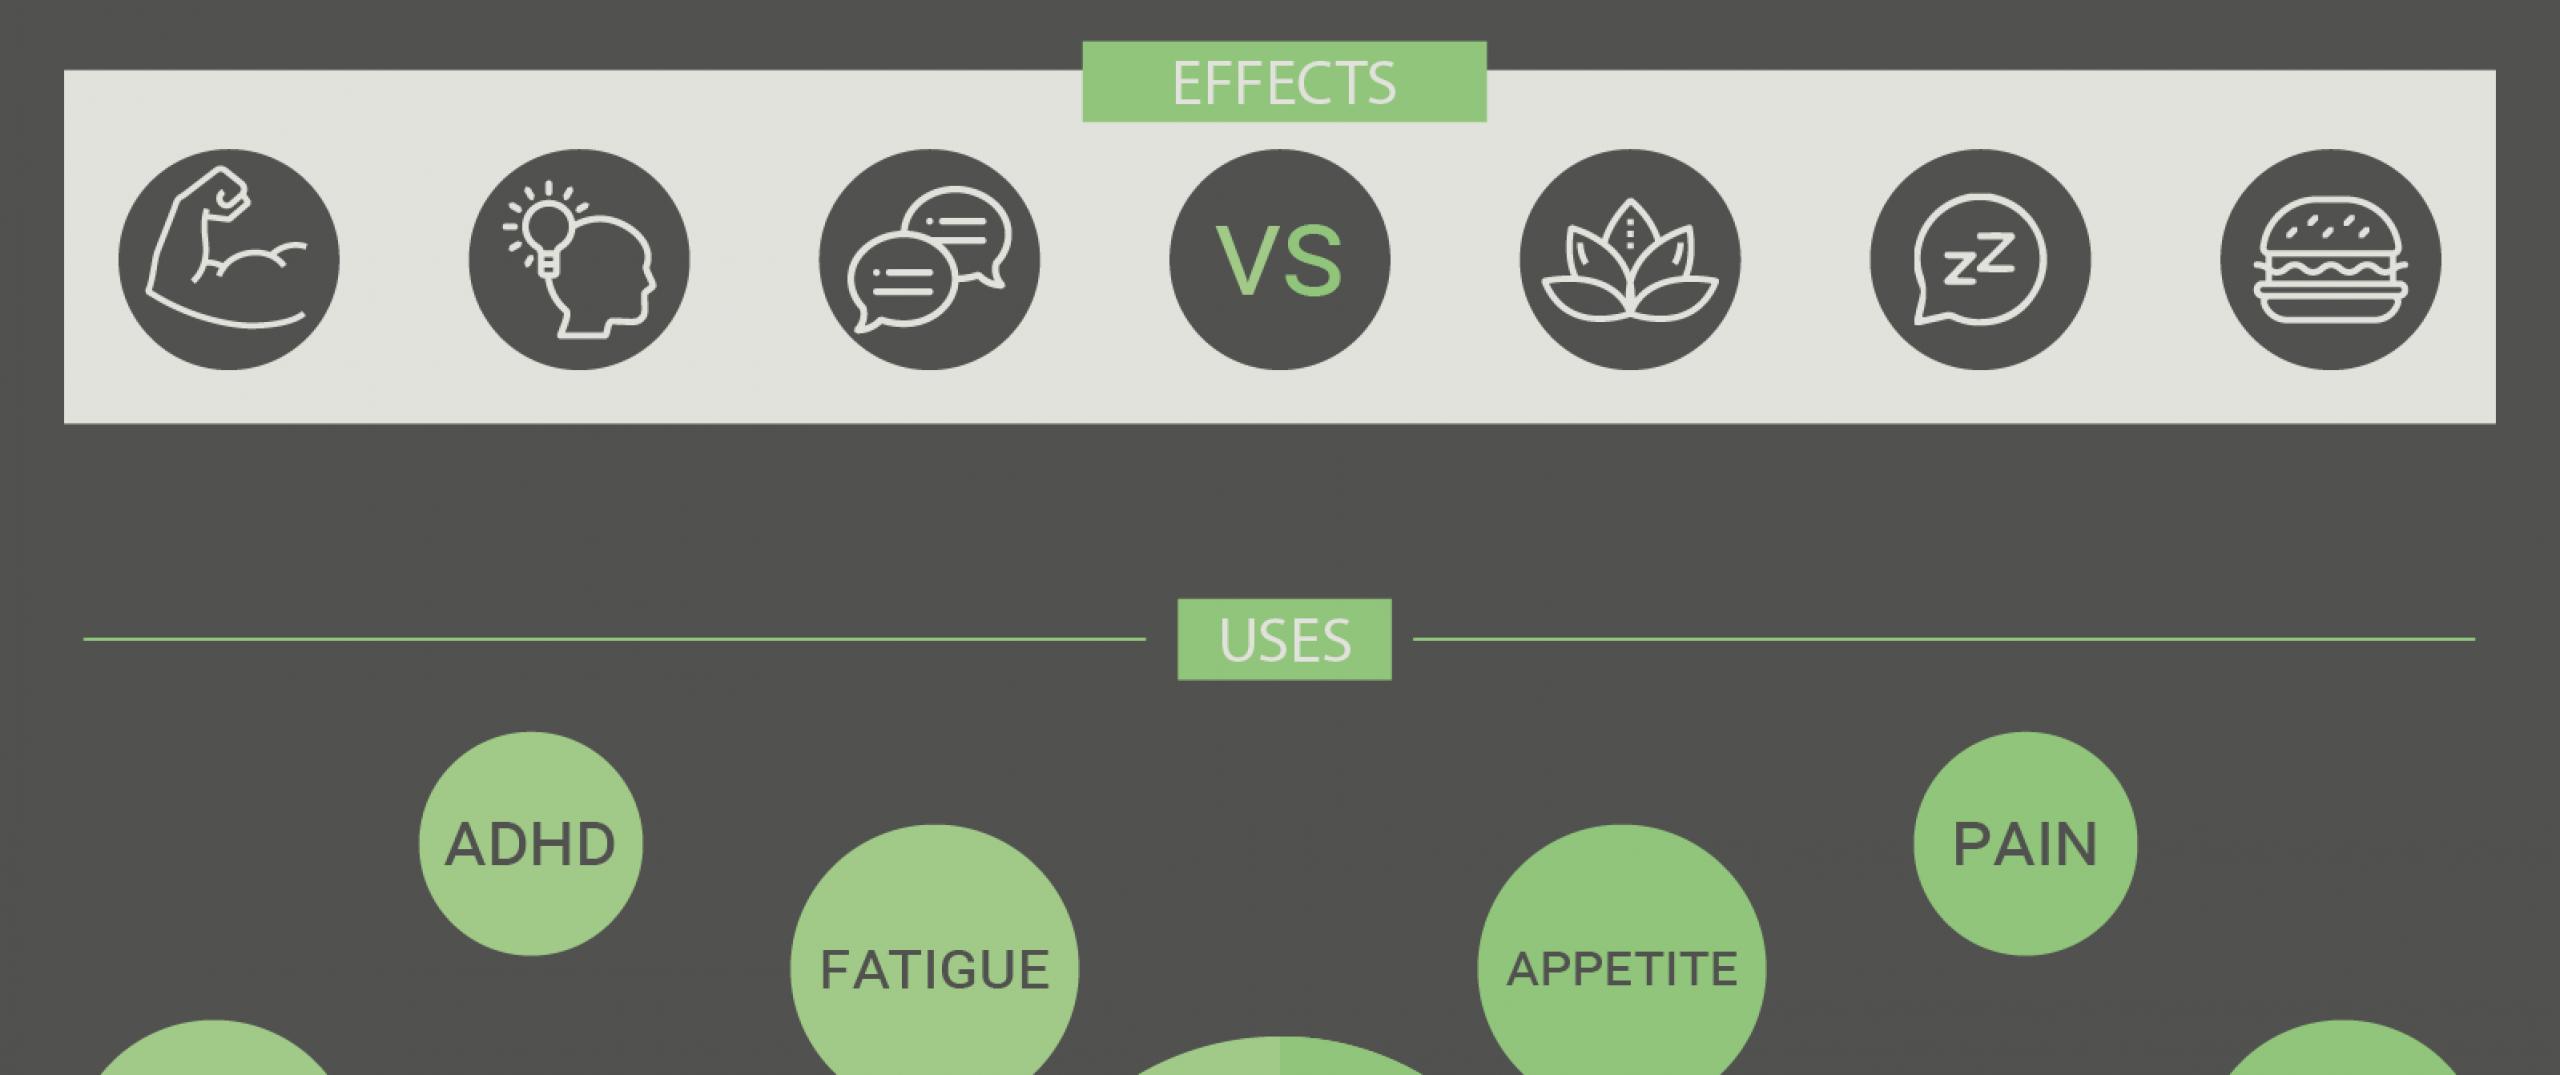 aux_infographic_02